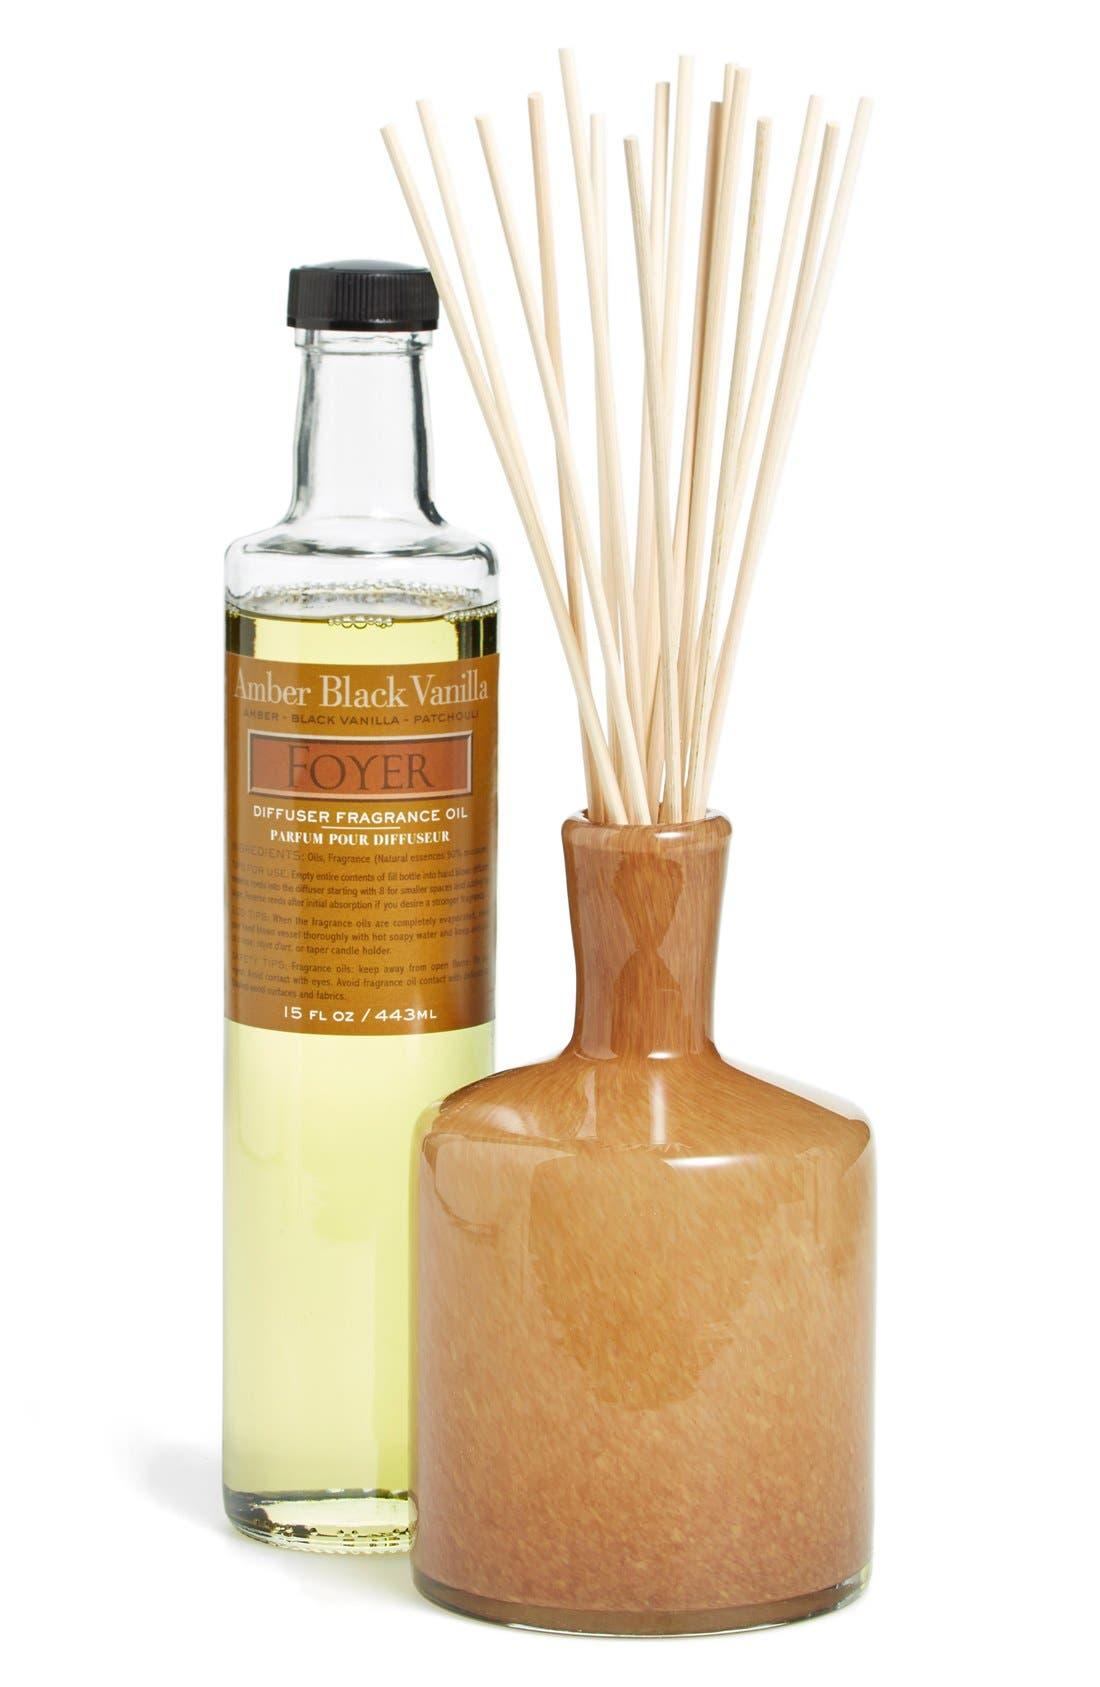 'Amber Black Vanilla - Foyer' Fragrance Diffuser,                             Main thumbnail 1, color,                             NO COLOR